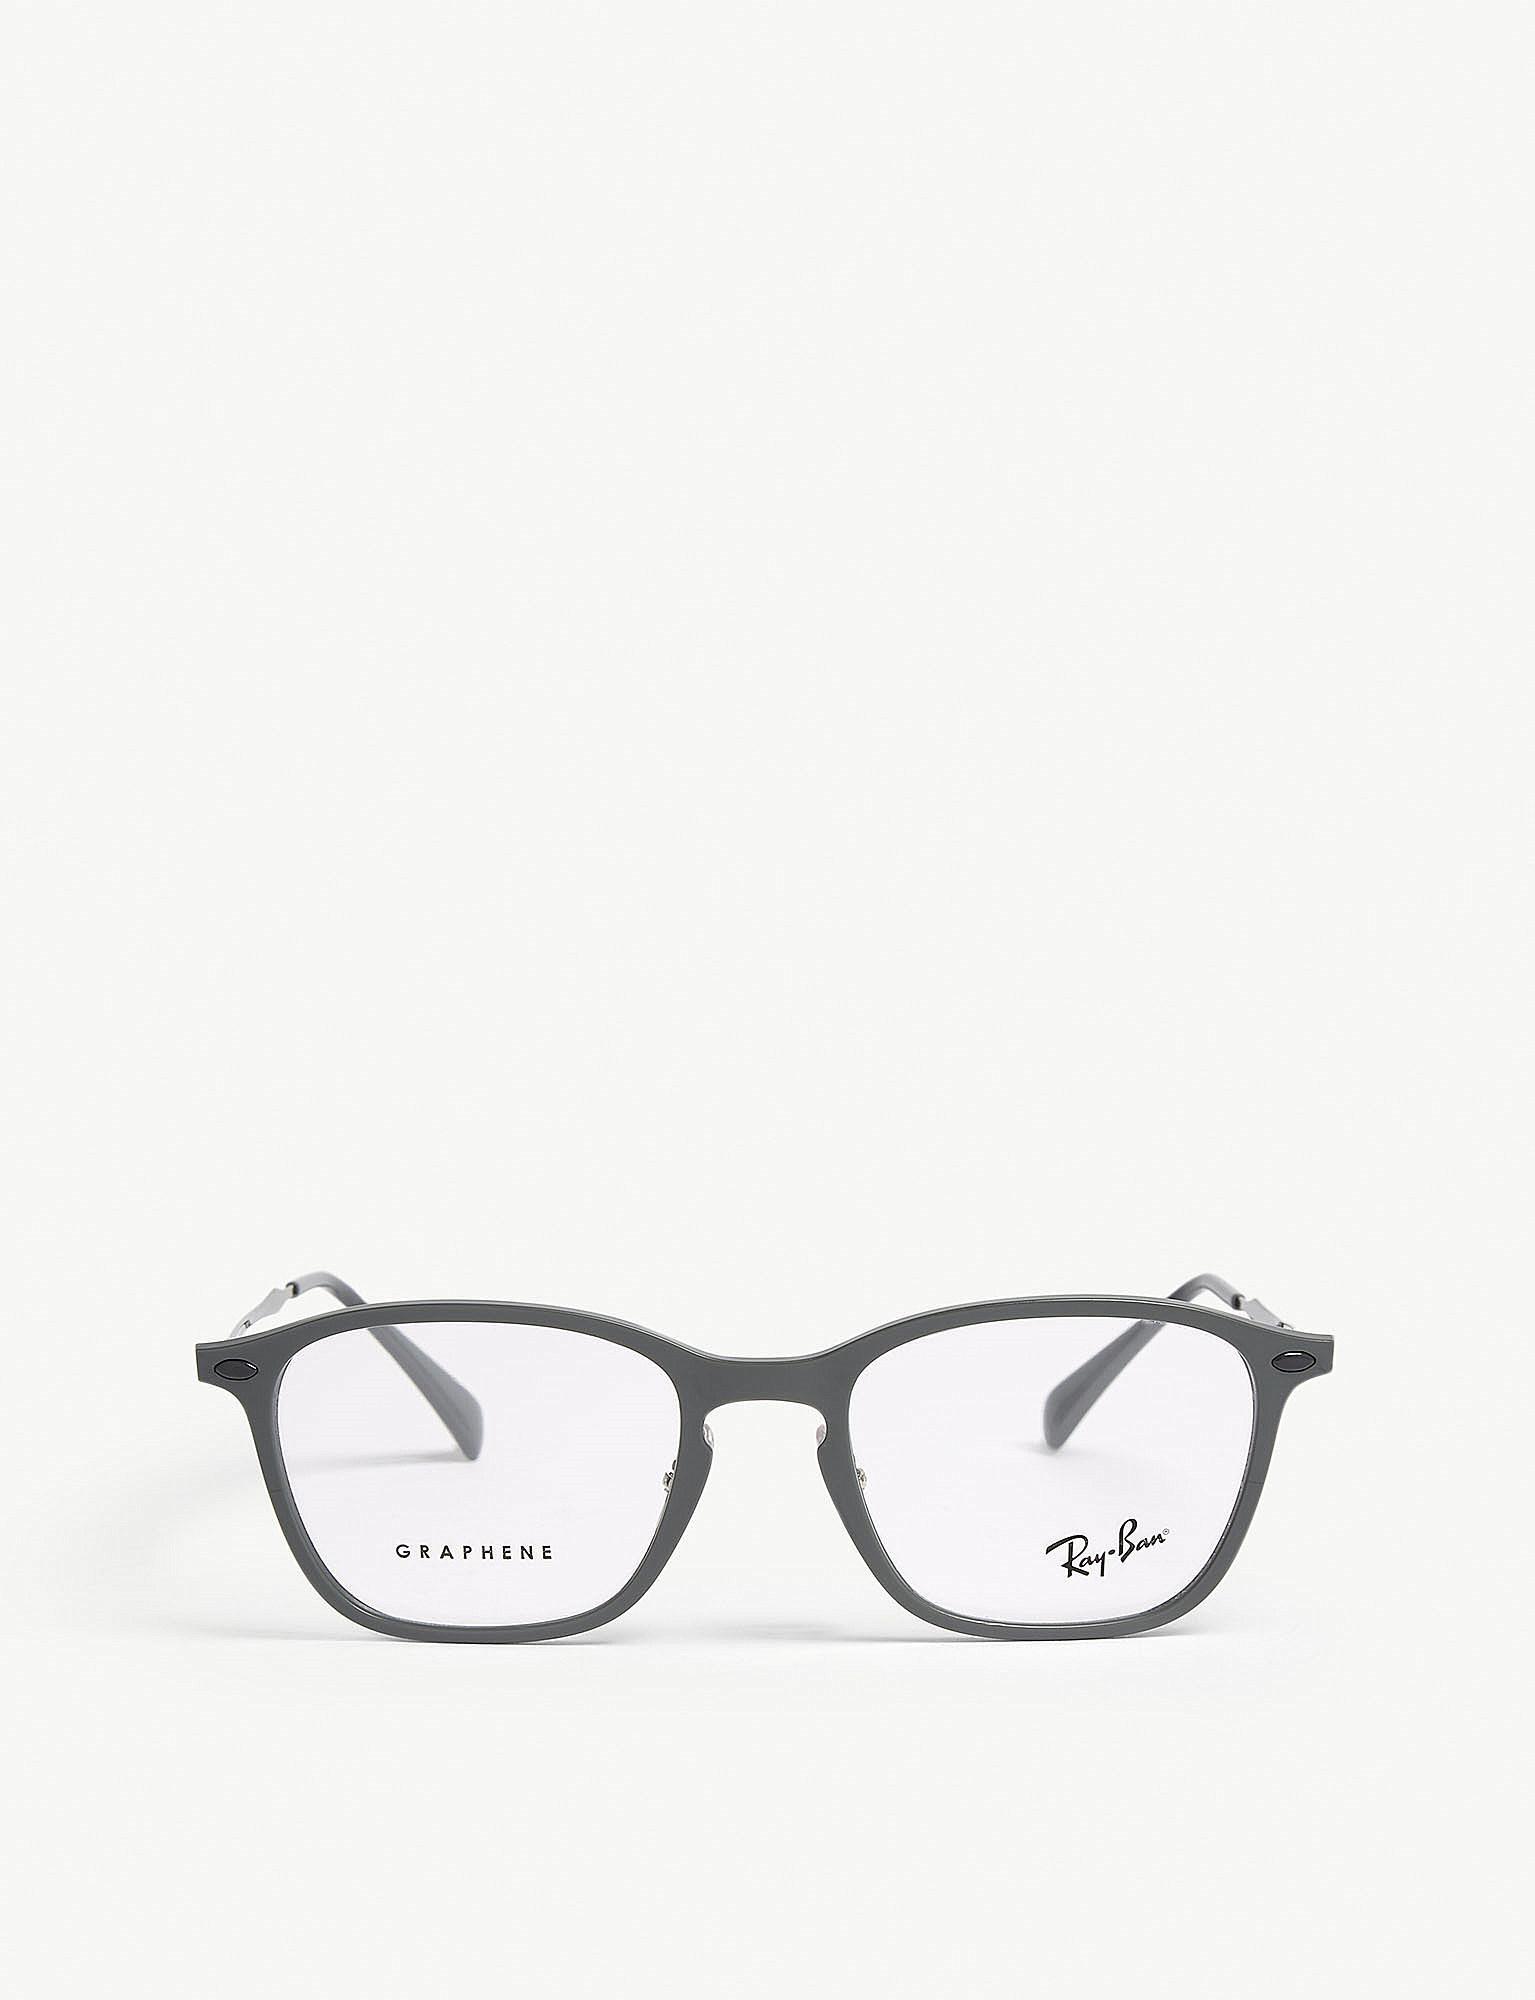 b43224ec68 Lyst - Ray-Ban Graphene Rb8953 Glasses in Gray